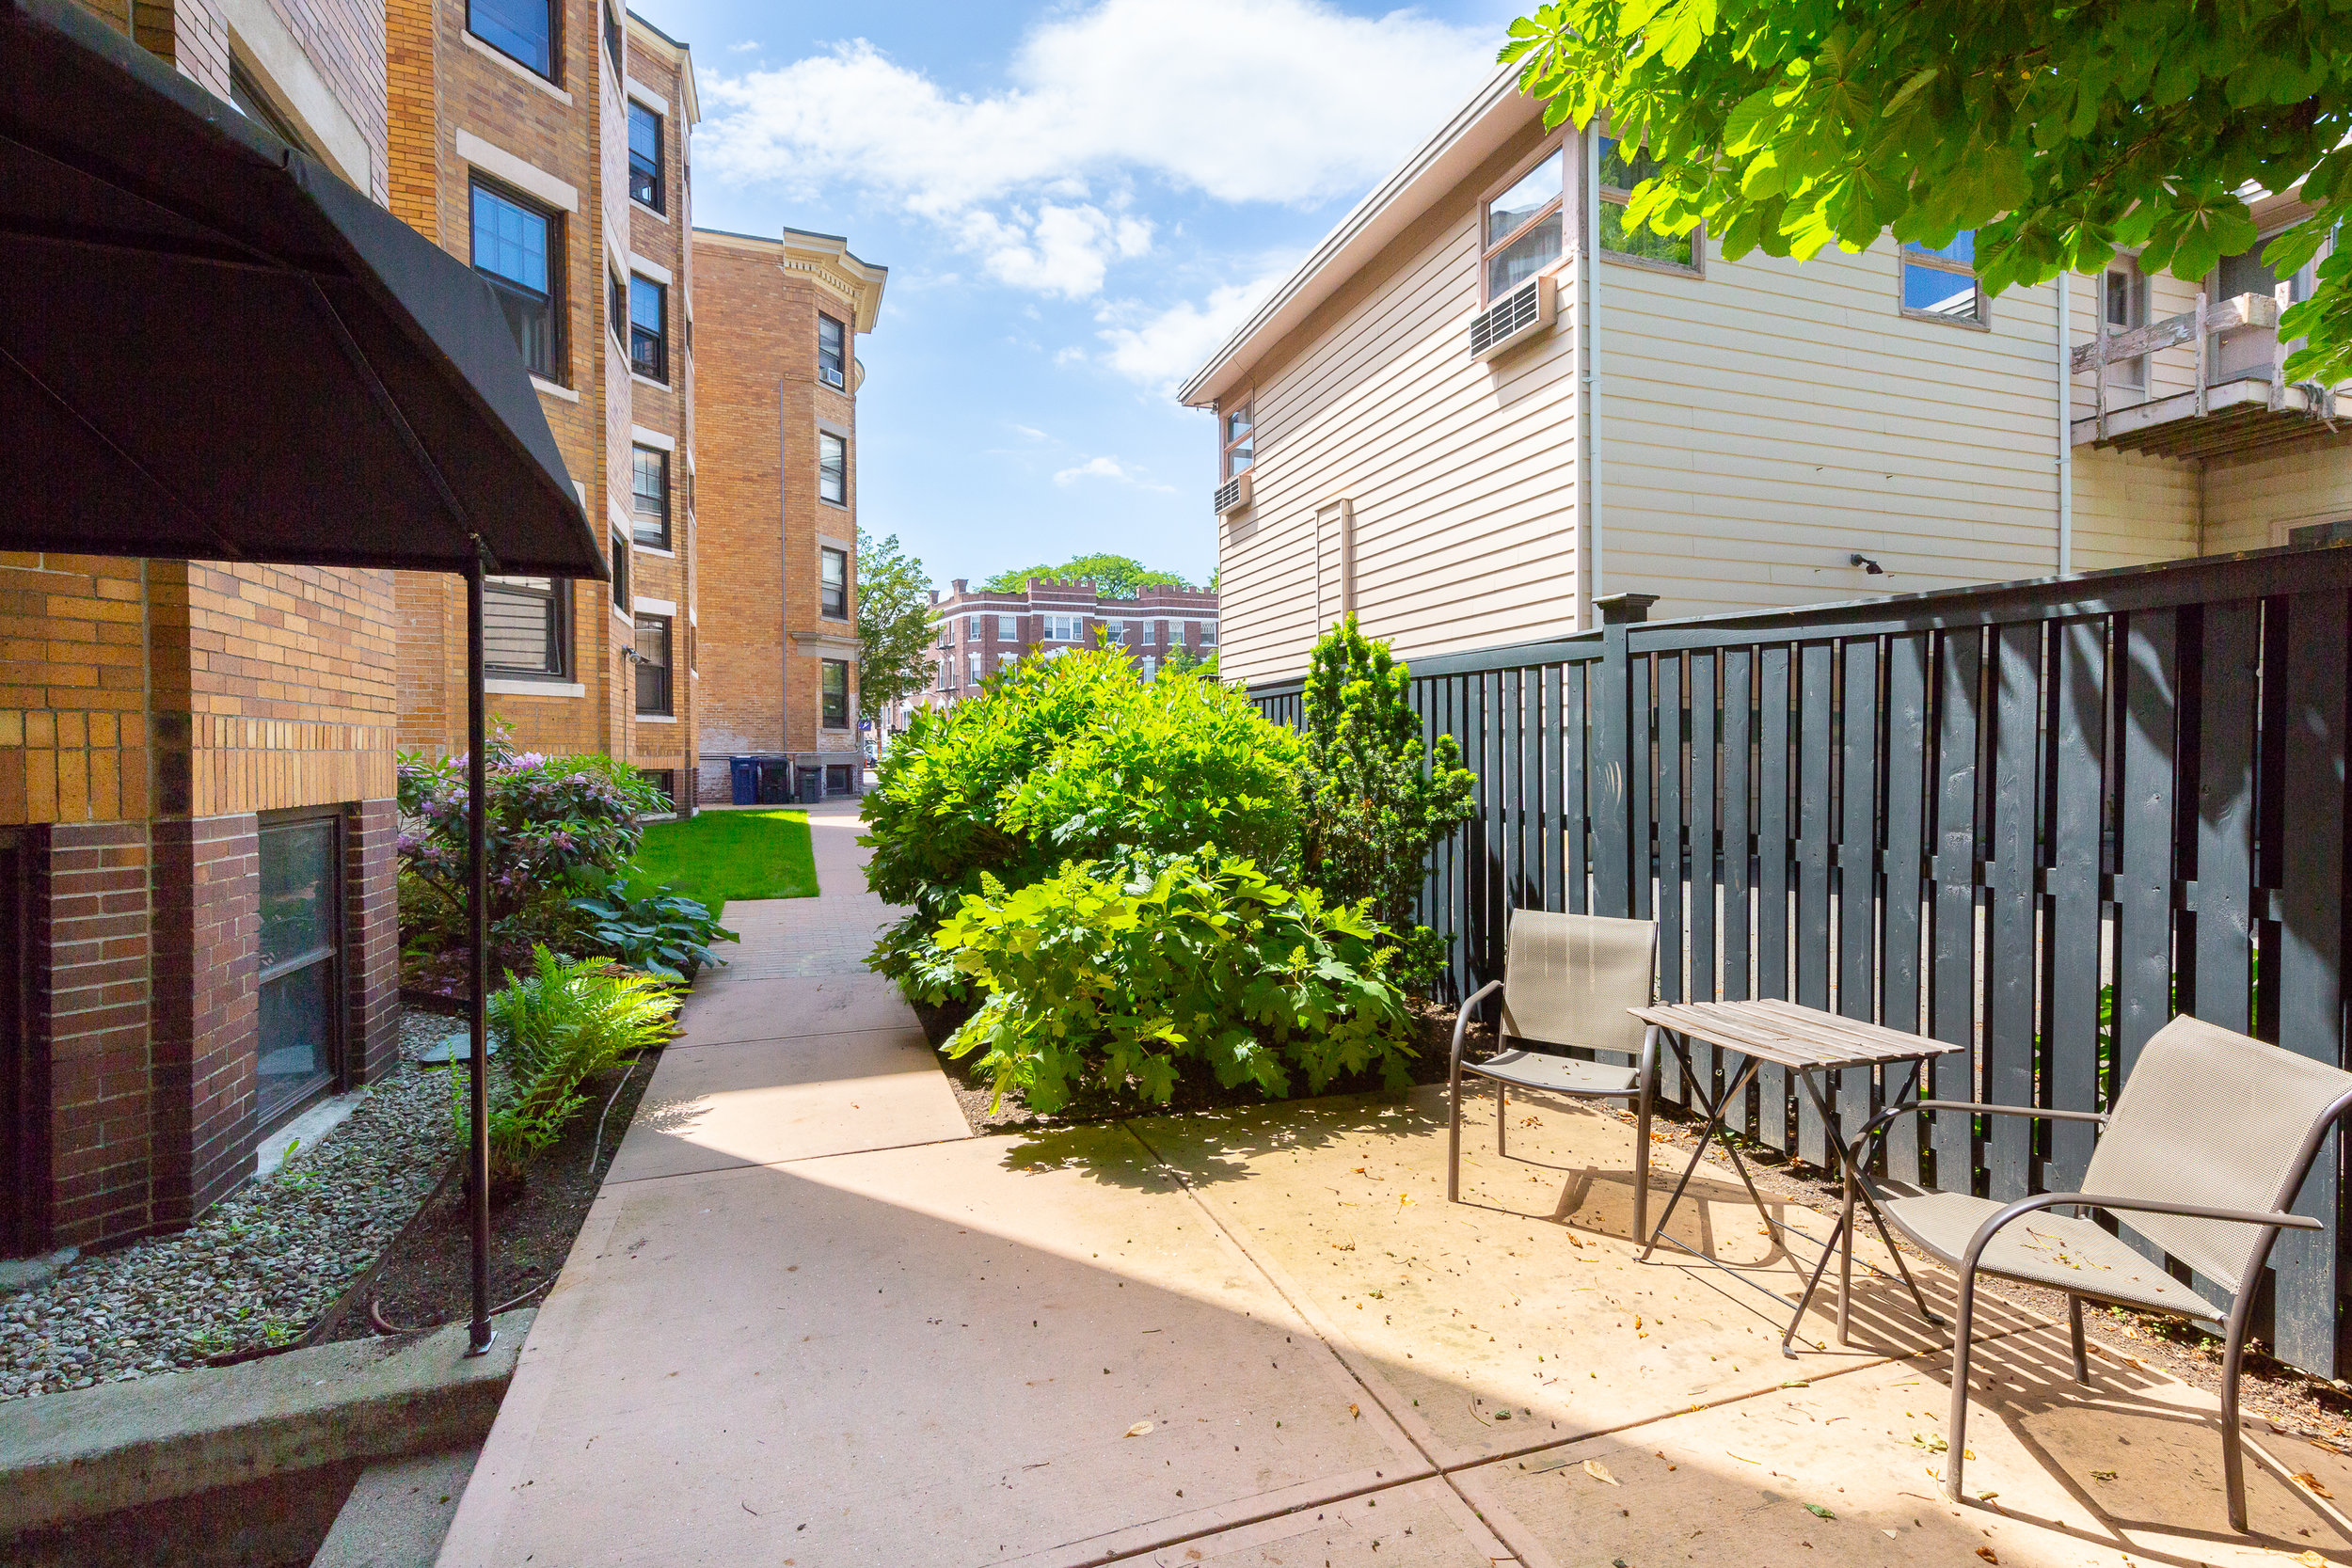 1783 Massachusetts Ave, Cambridge, MA_Property-Precision-1.jpg